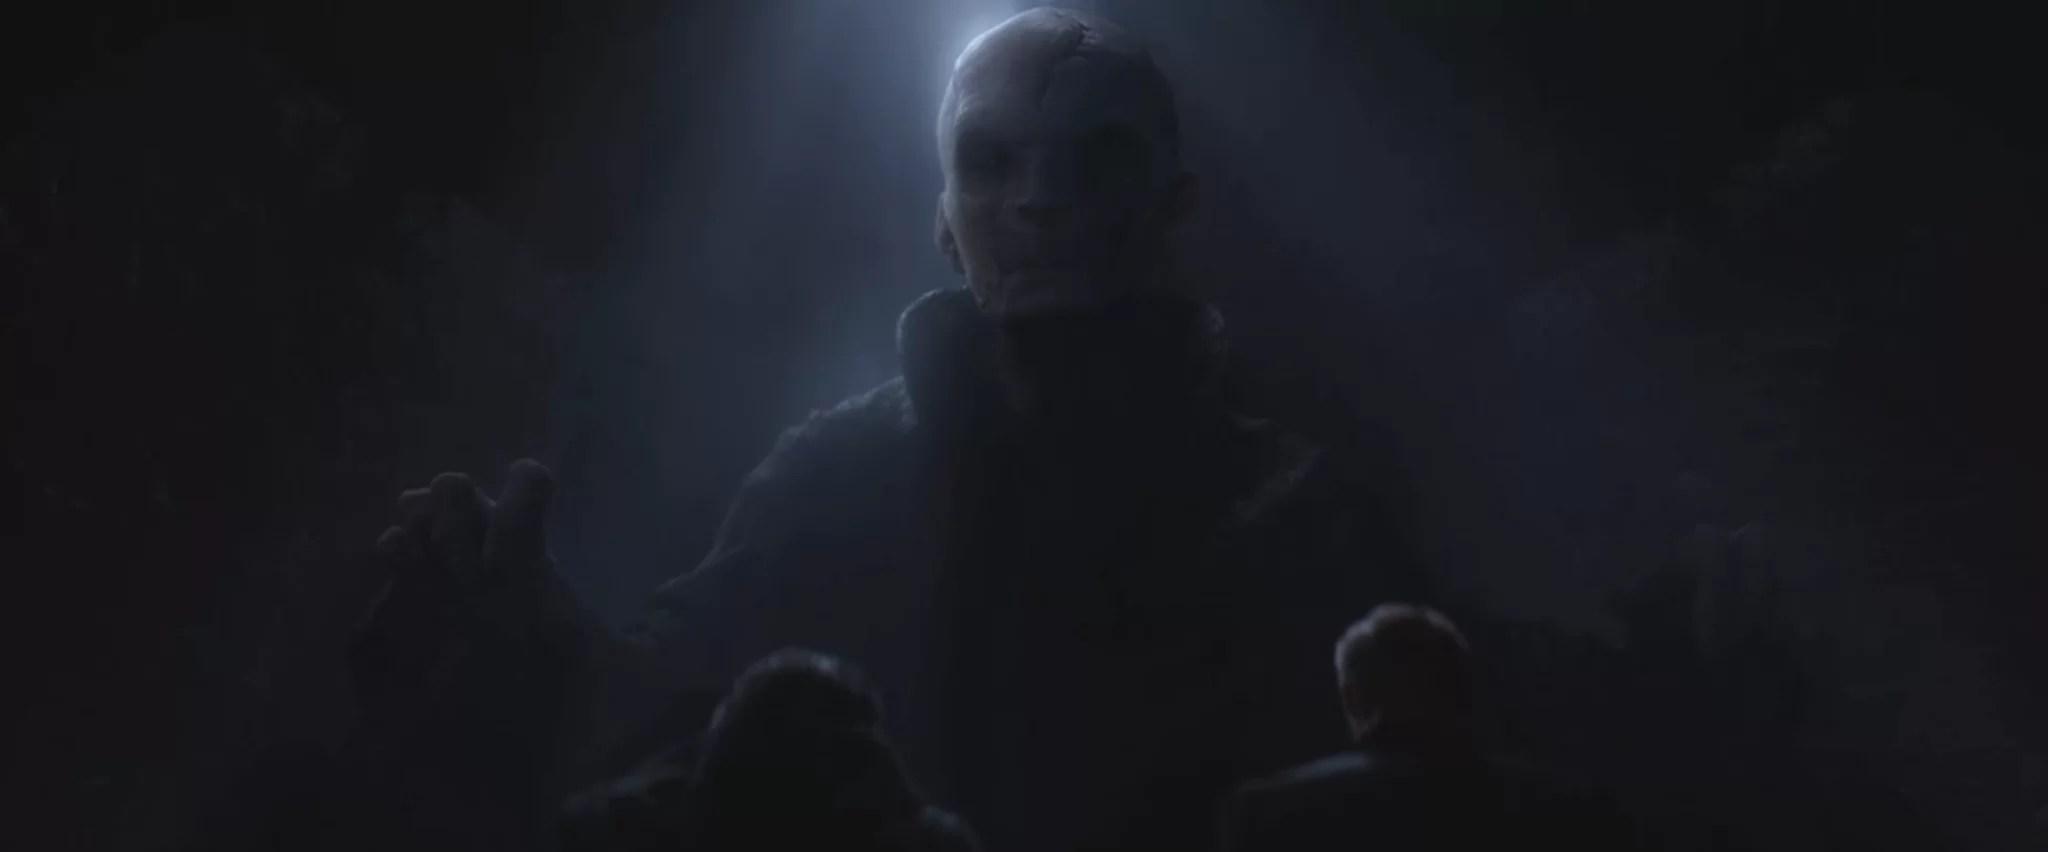 Dark Knight Falls Wallpaper Mace Windu Is Supreme Leader Snoke Star Wars Theory